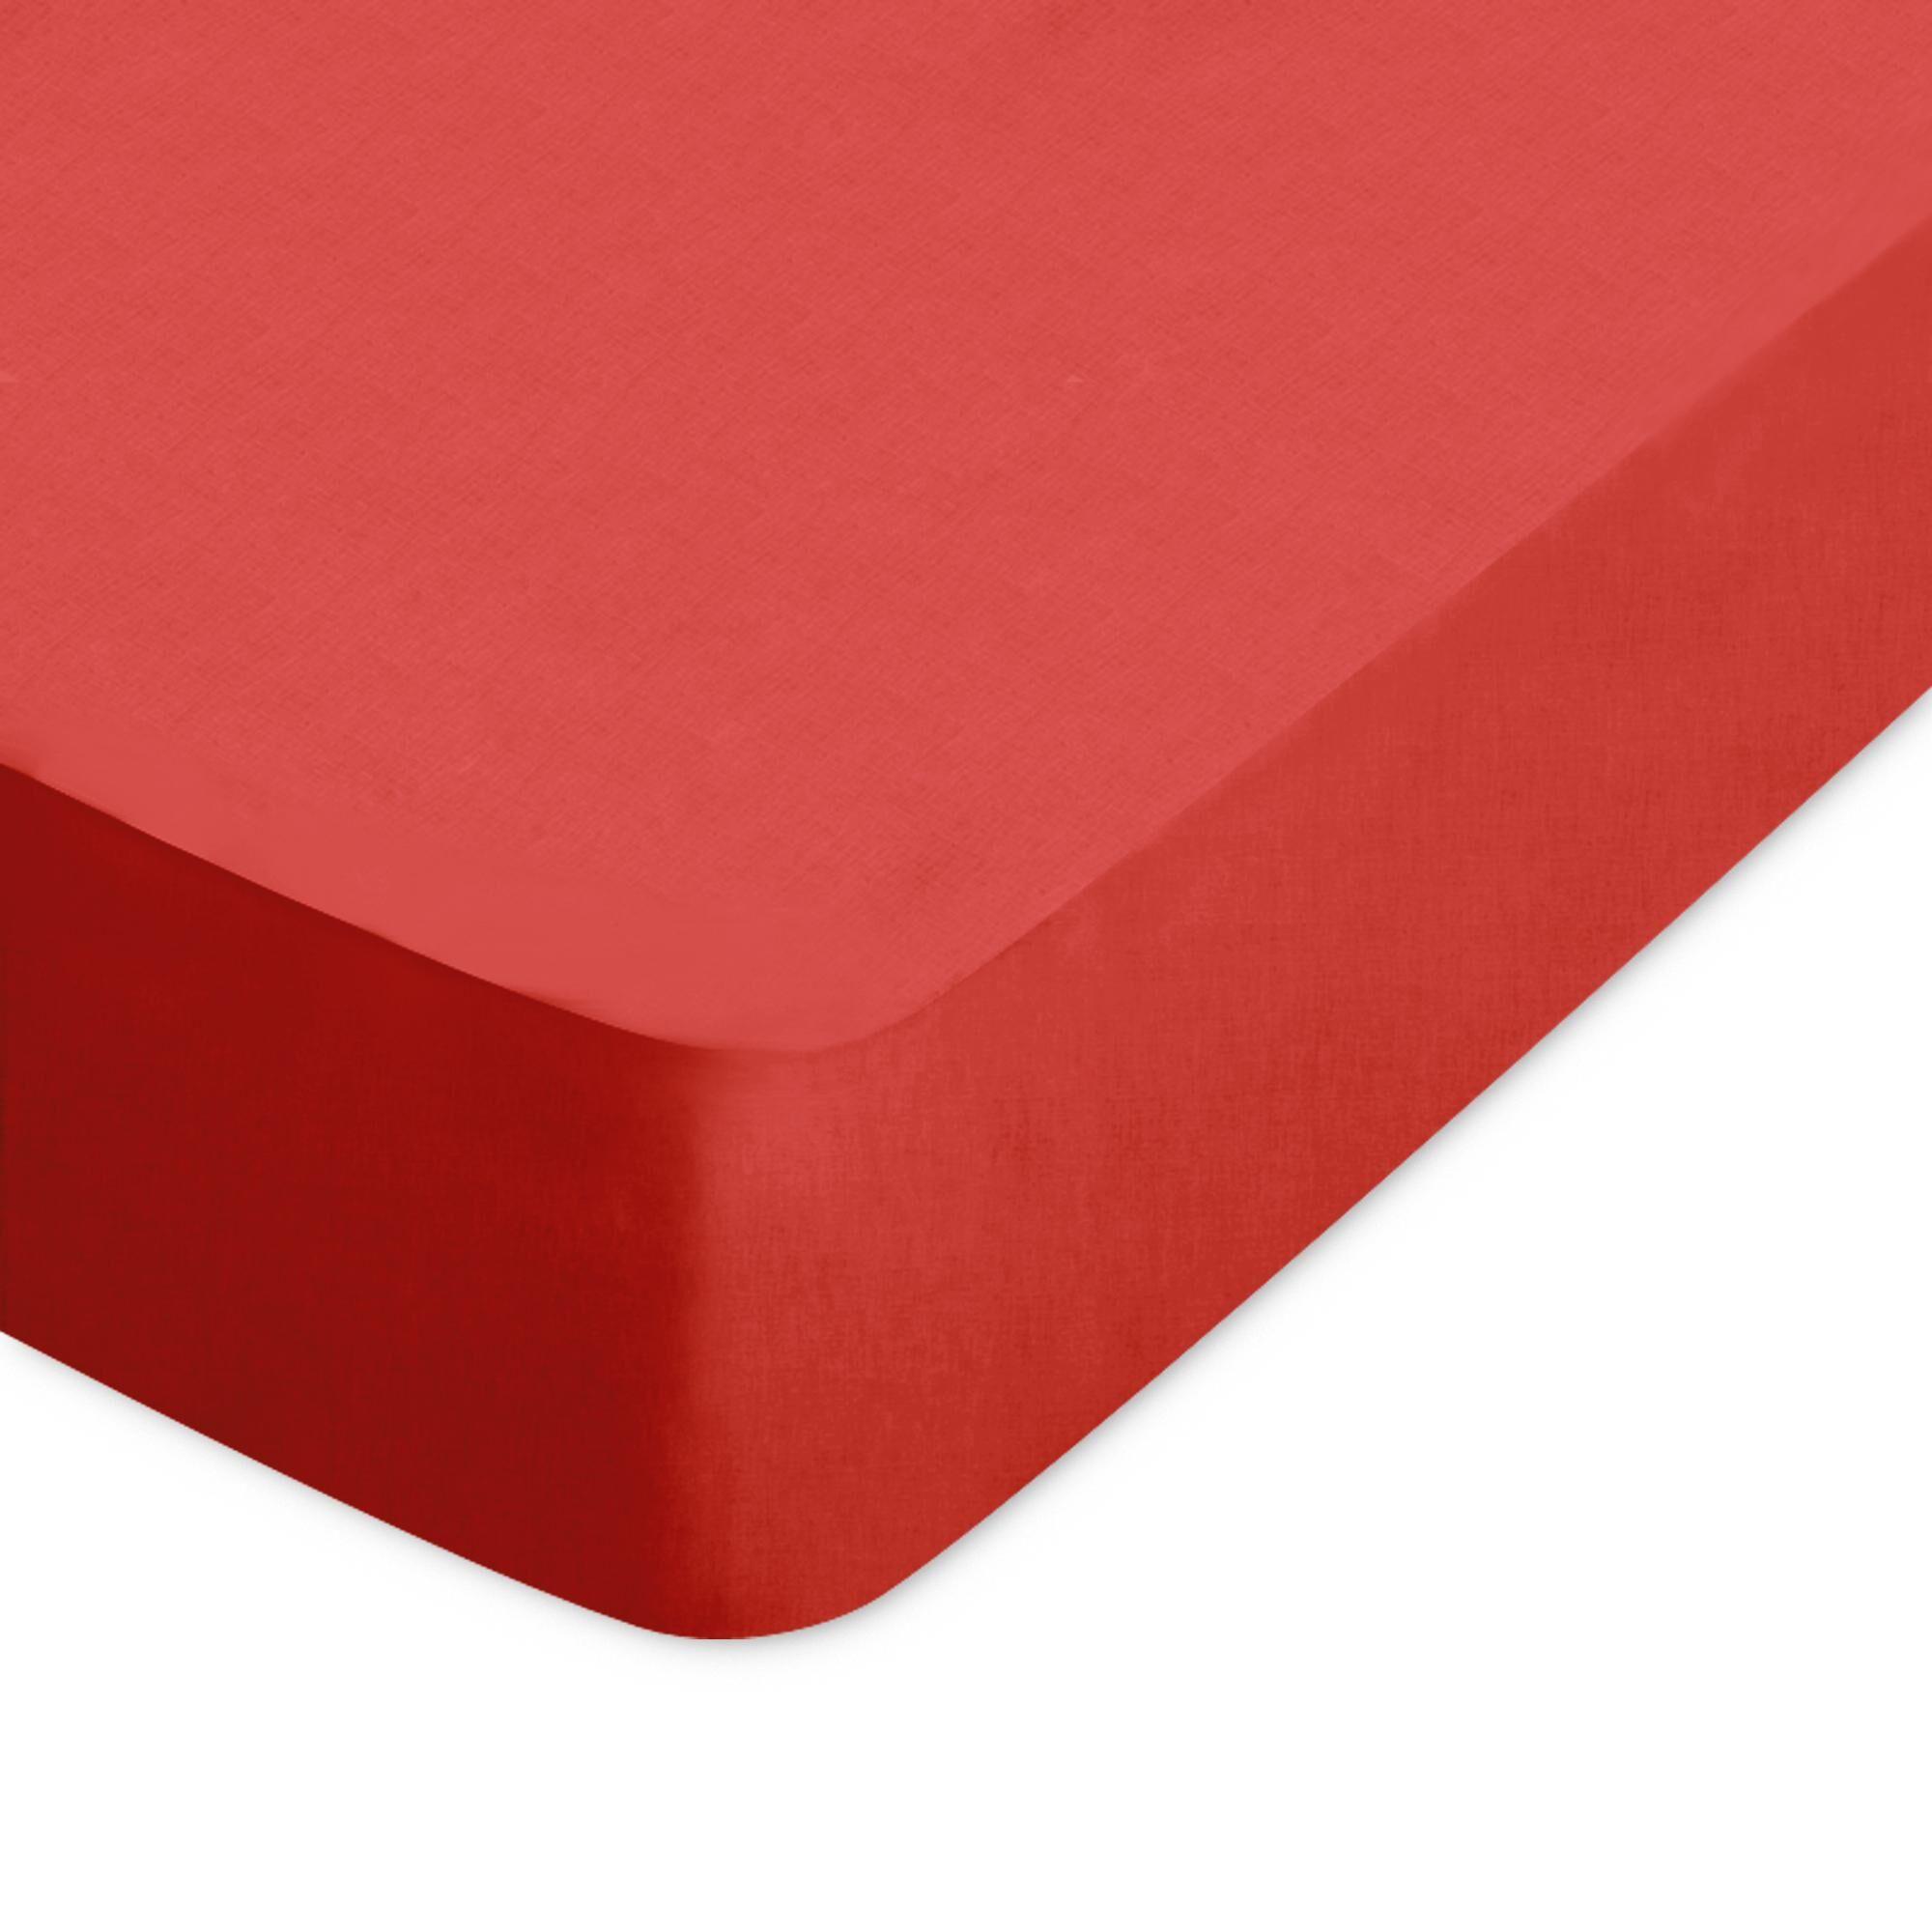 Linnea Drap housse uni 220x220 cm 100% coton ALTO orange Baie de Goji